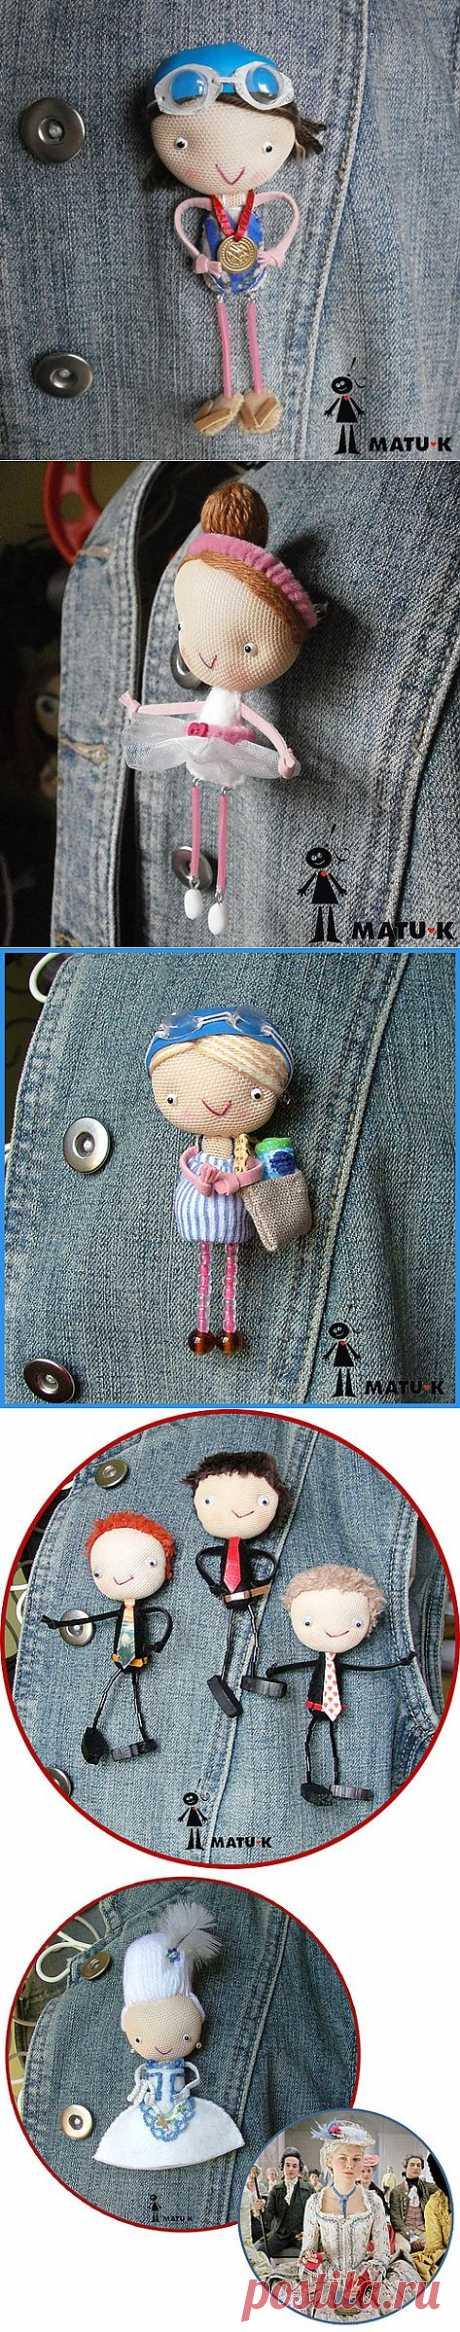 Flickr: Забавные куклы-брошки мастерицы MATU-K